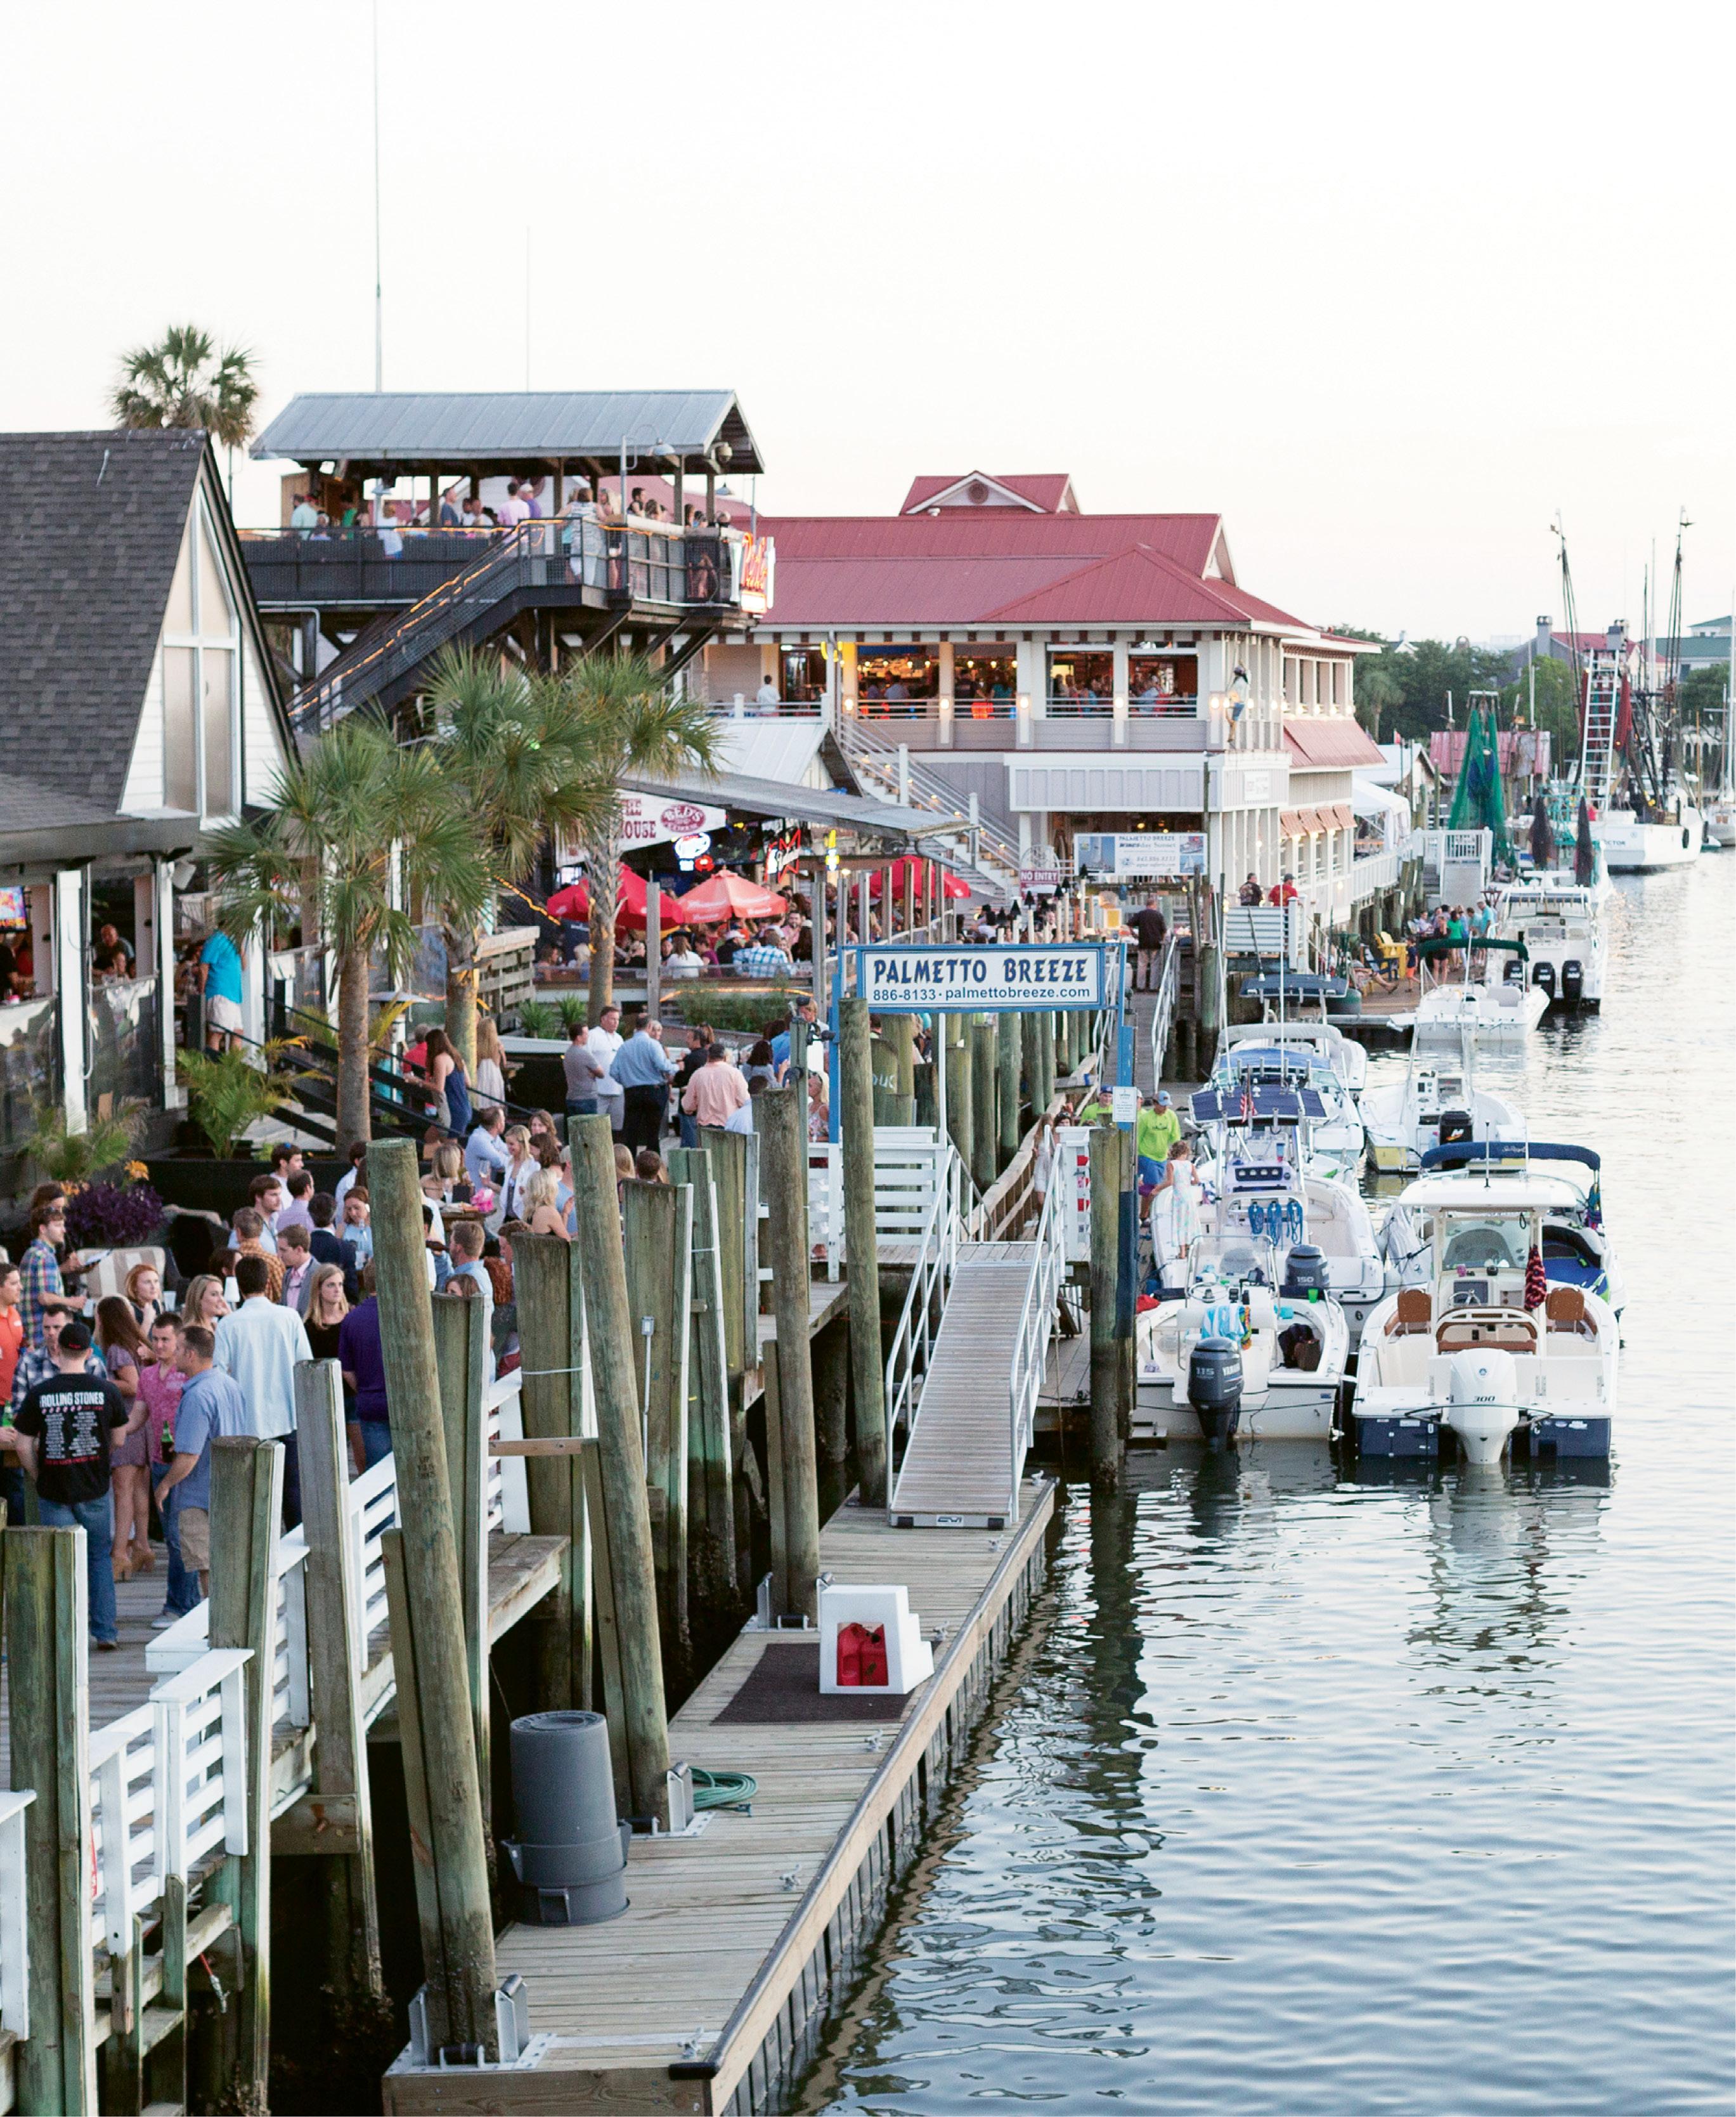 Shem Creek's bustling docks host 4,000 people or more during any given week.